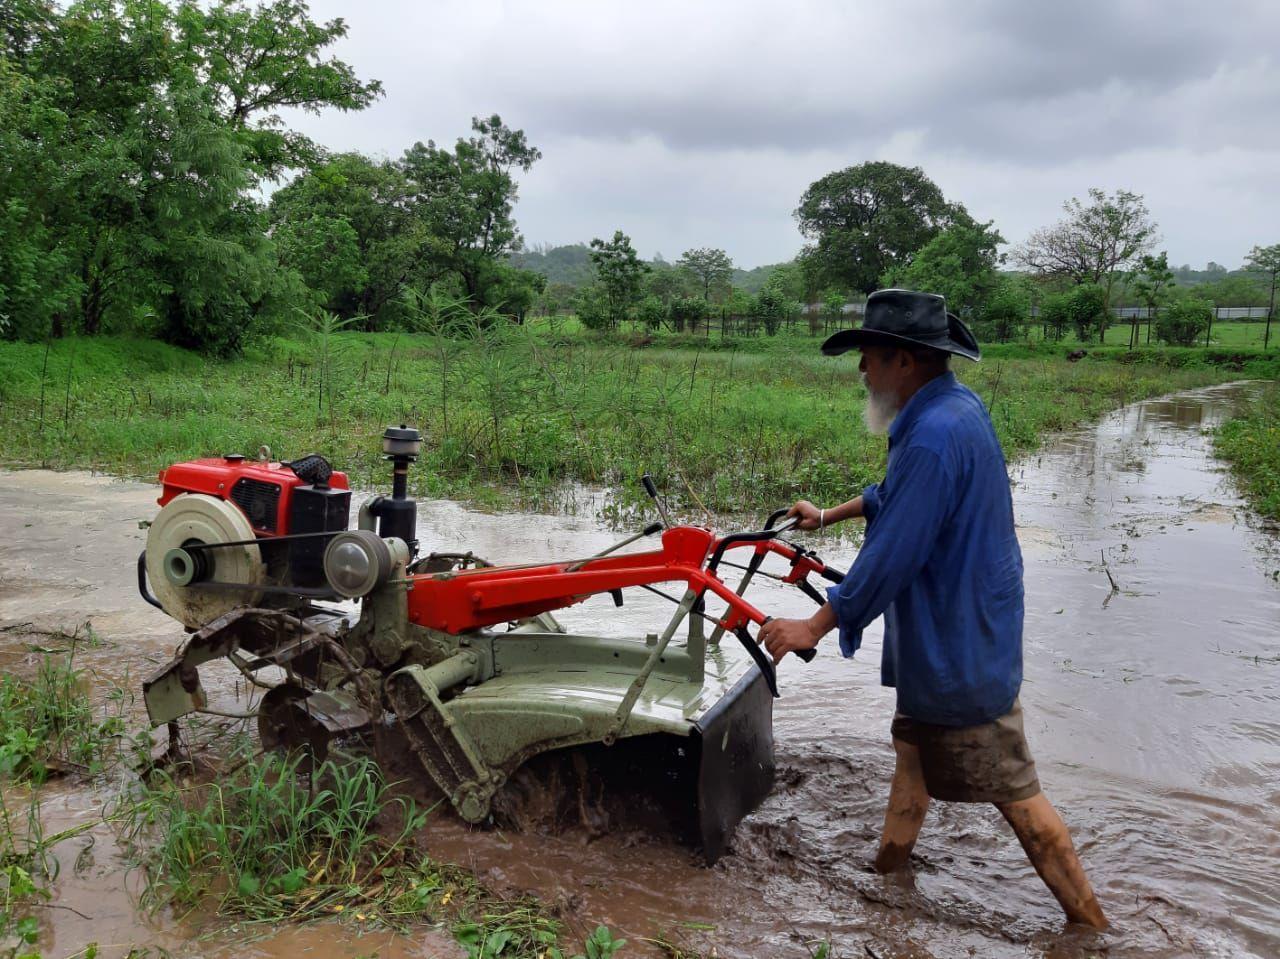 Maharashtra Farmer Grows 180+ Varieties of Food Through